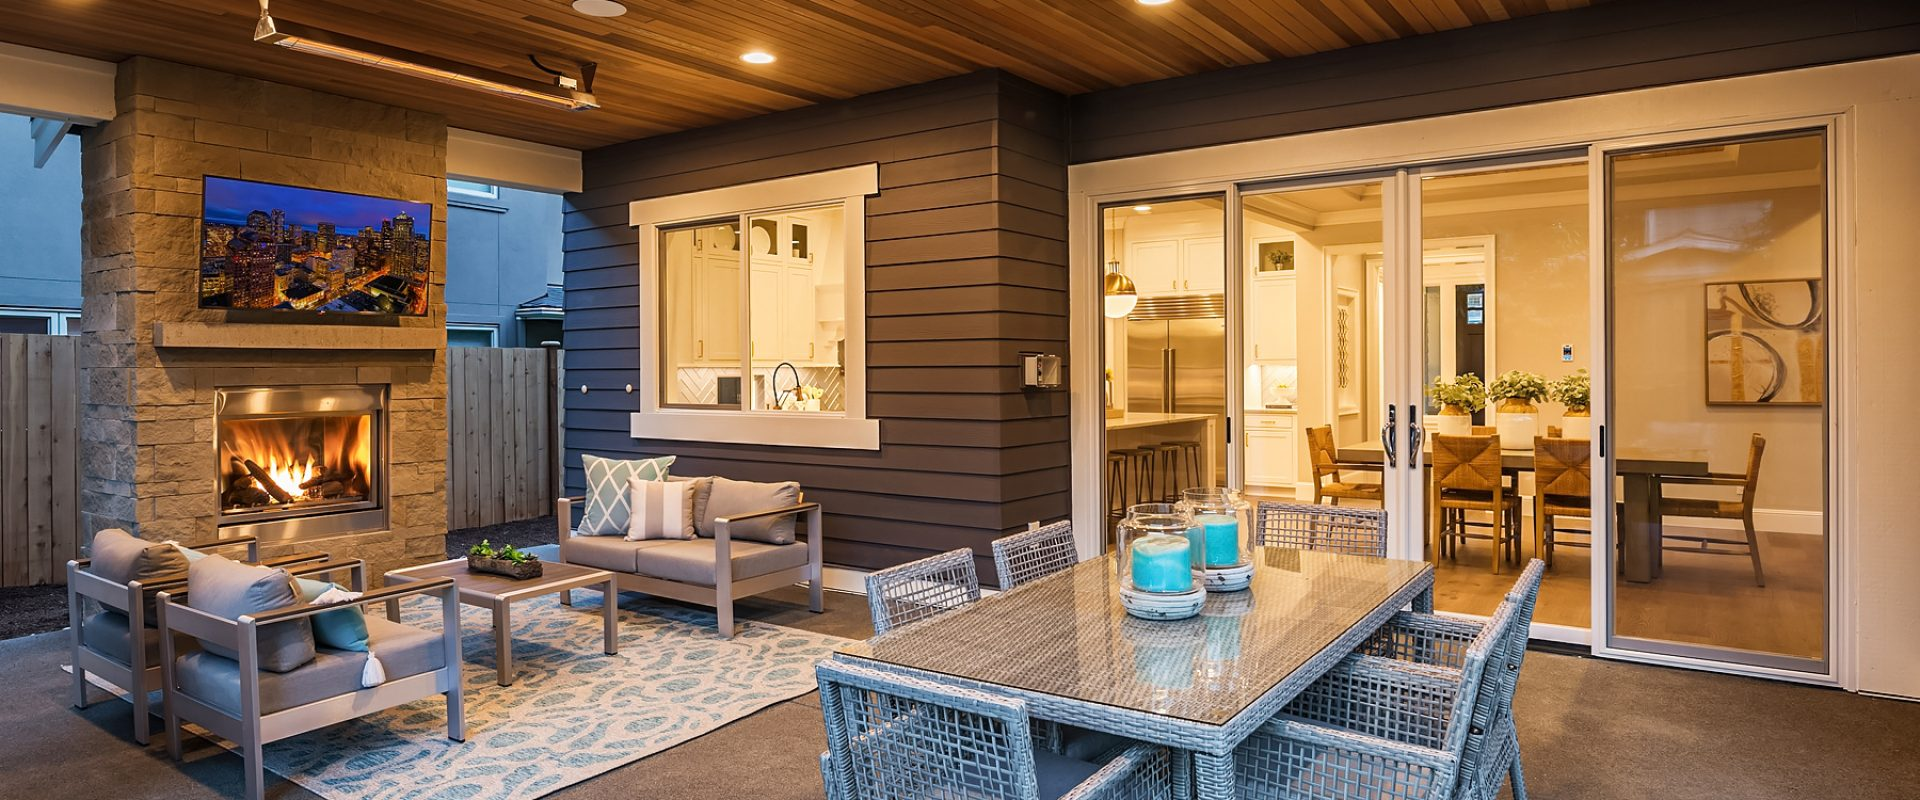 193-35-2126 104th PL SE-bellevue-wa-mn-custom-homes-patio